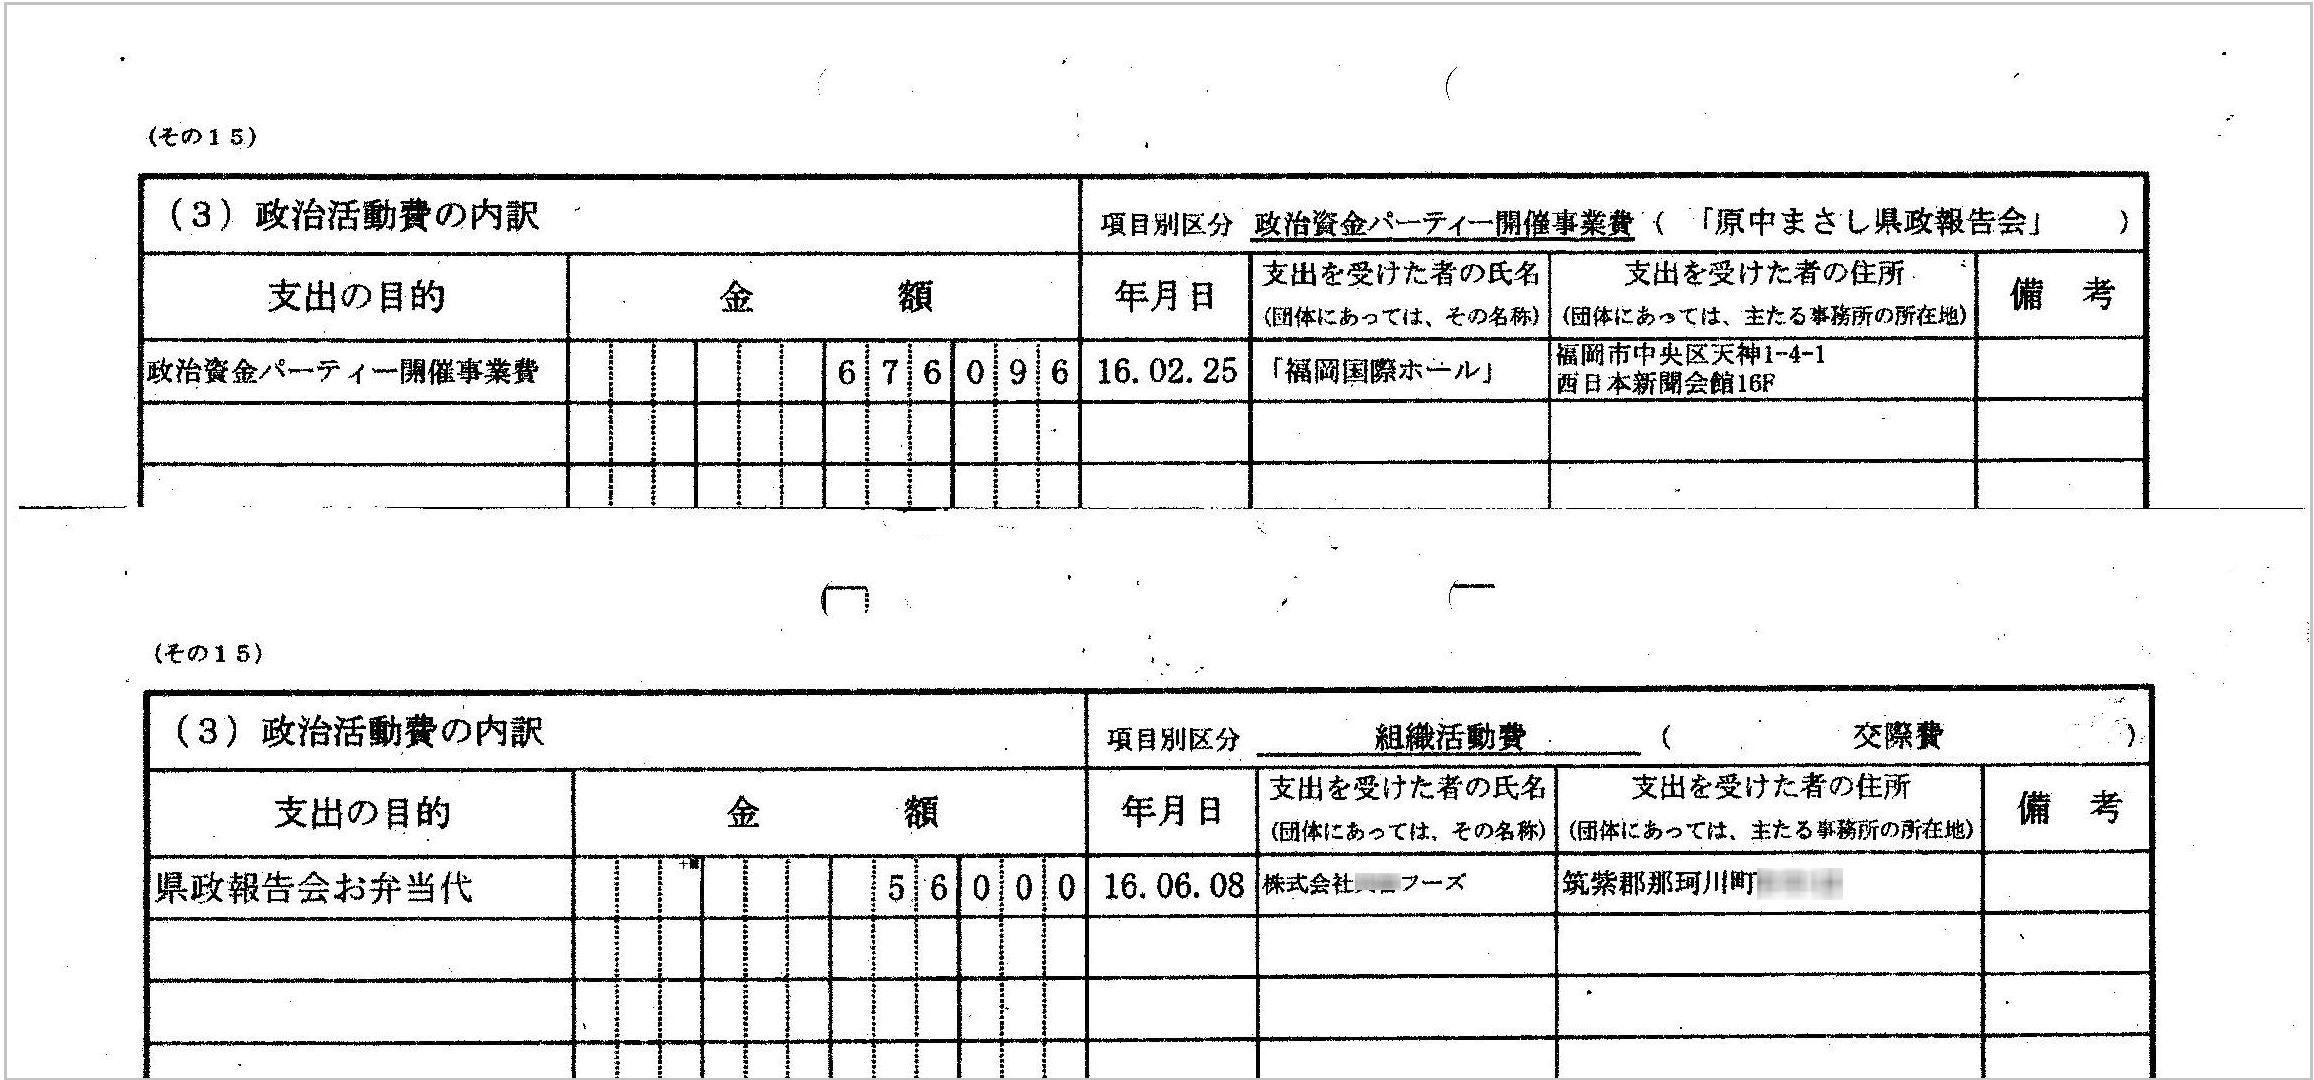 http://hunter-investigate.jp/news/bd0c7d973b76ae885c6e4926f0a60d695f57f713.jpg